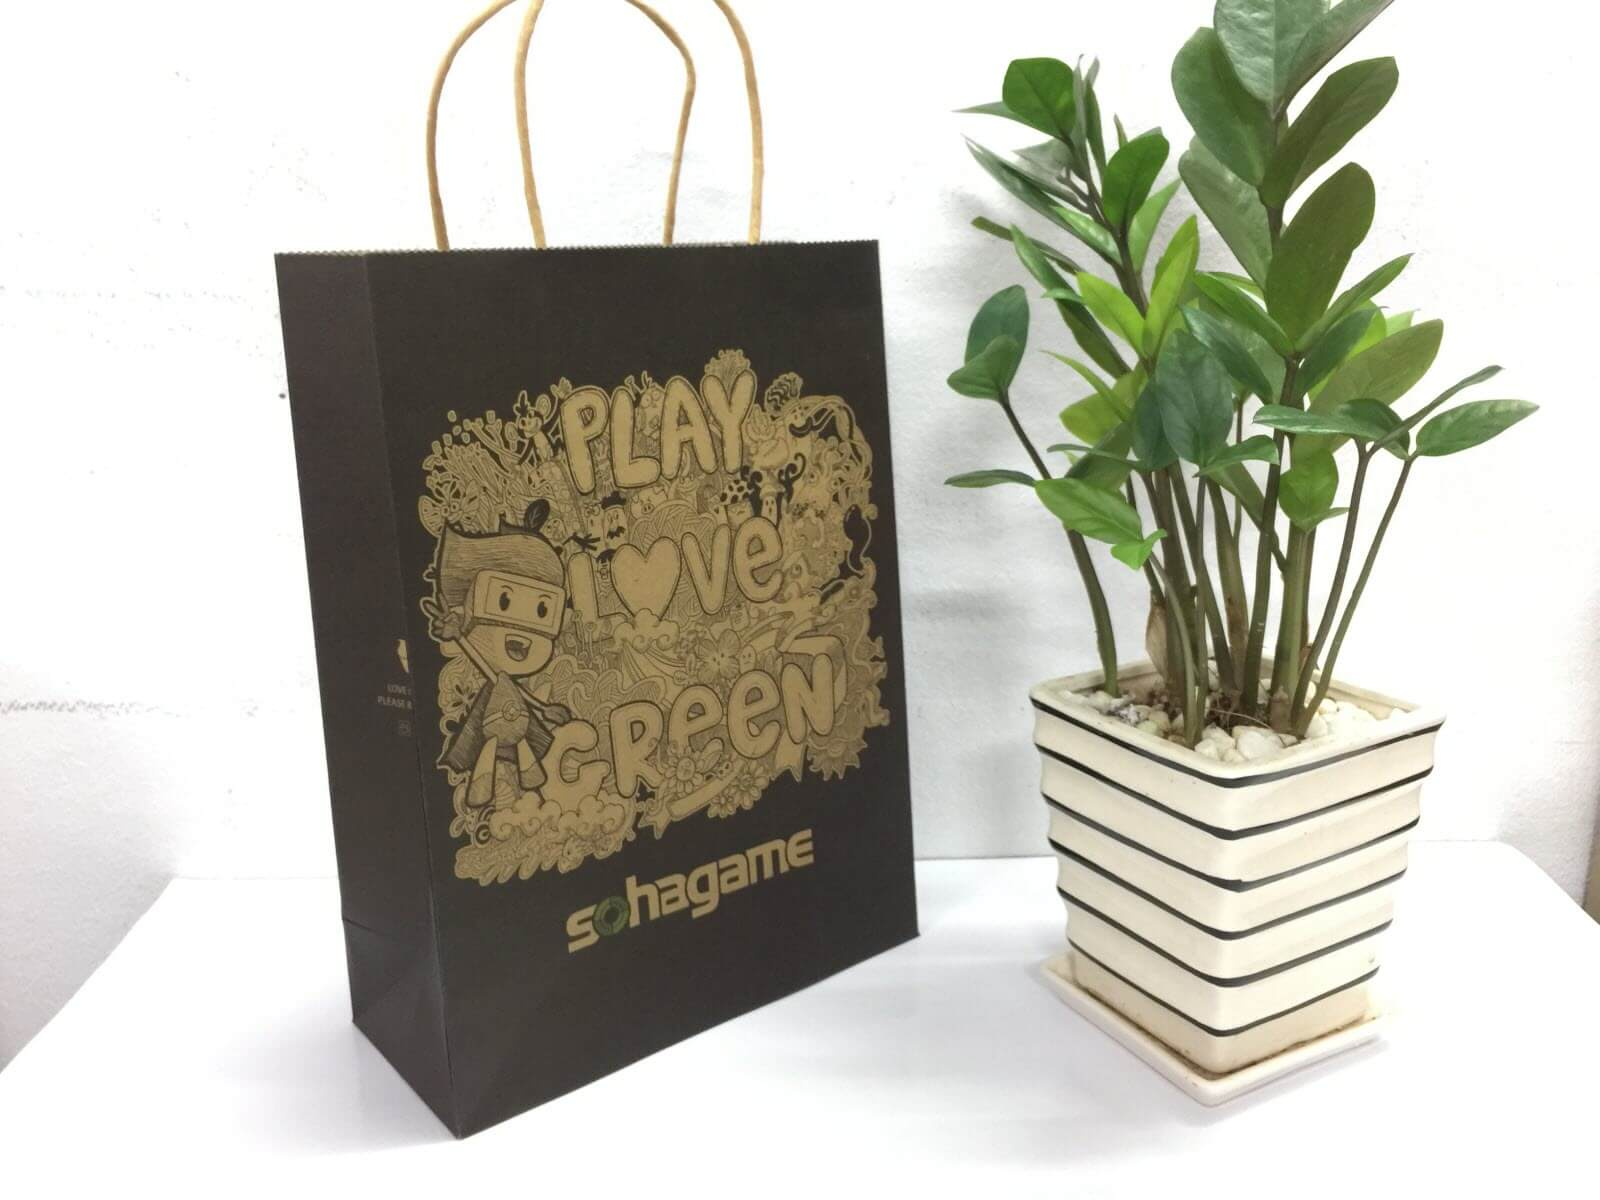 Túi giấy Sohagame - Chất liệu giấy Kraft